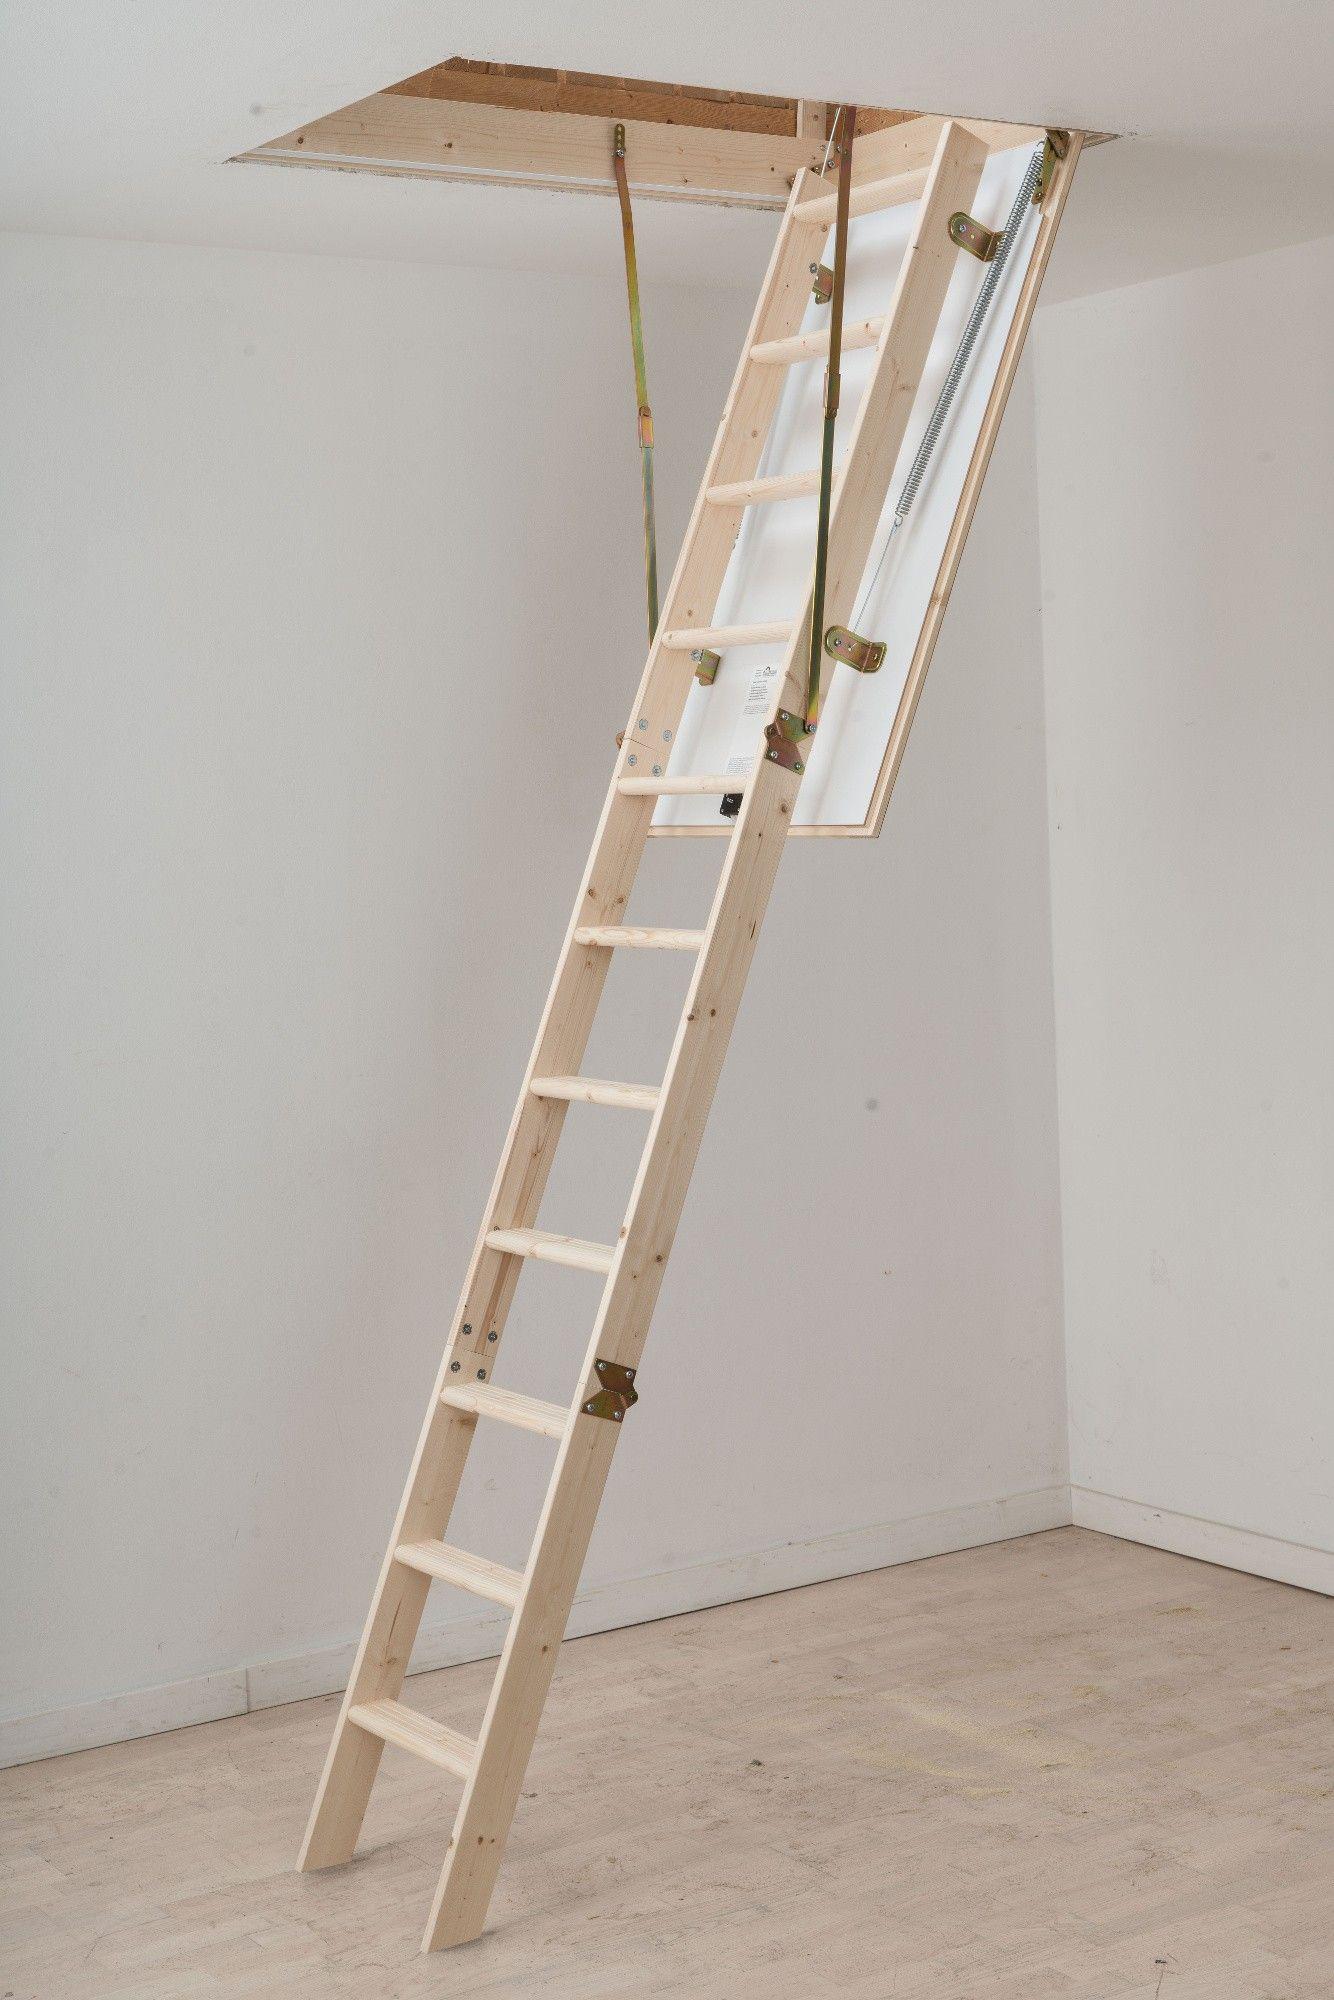 Dolle Hobby Timber Folding Loft Ladder 1200 X 700mm Attic Ladder Folding Ladder Ladder